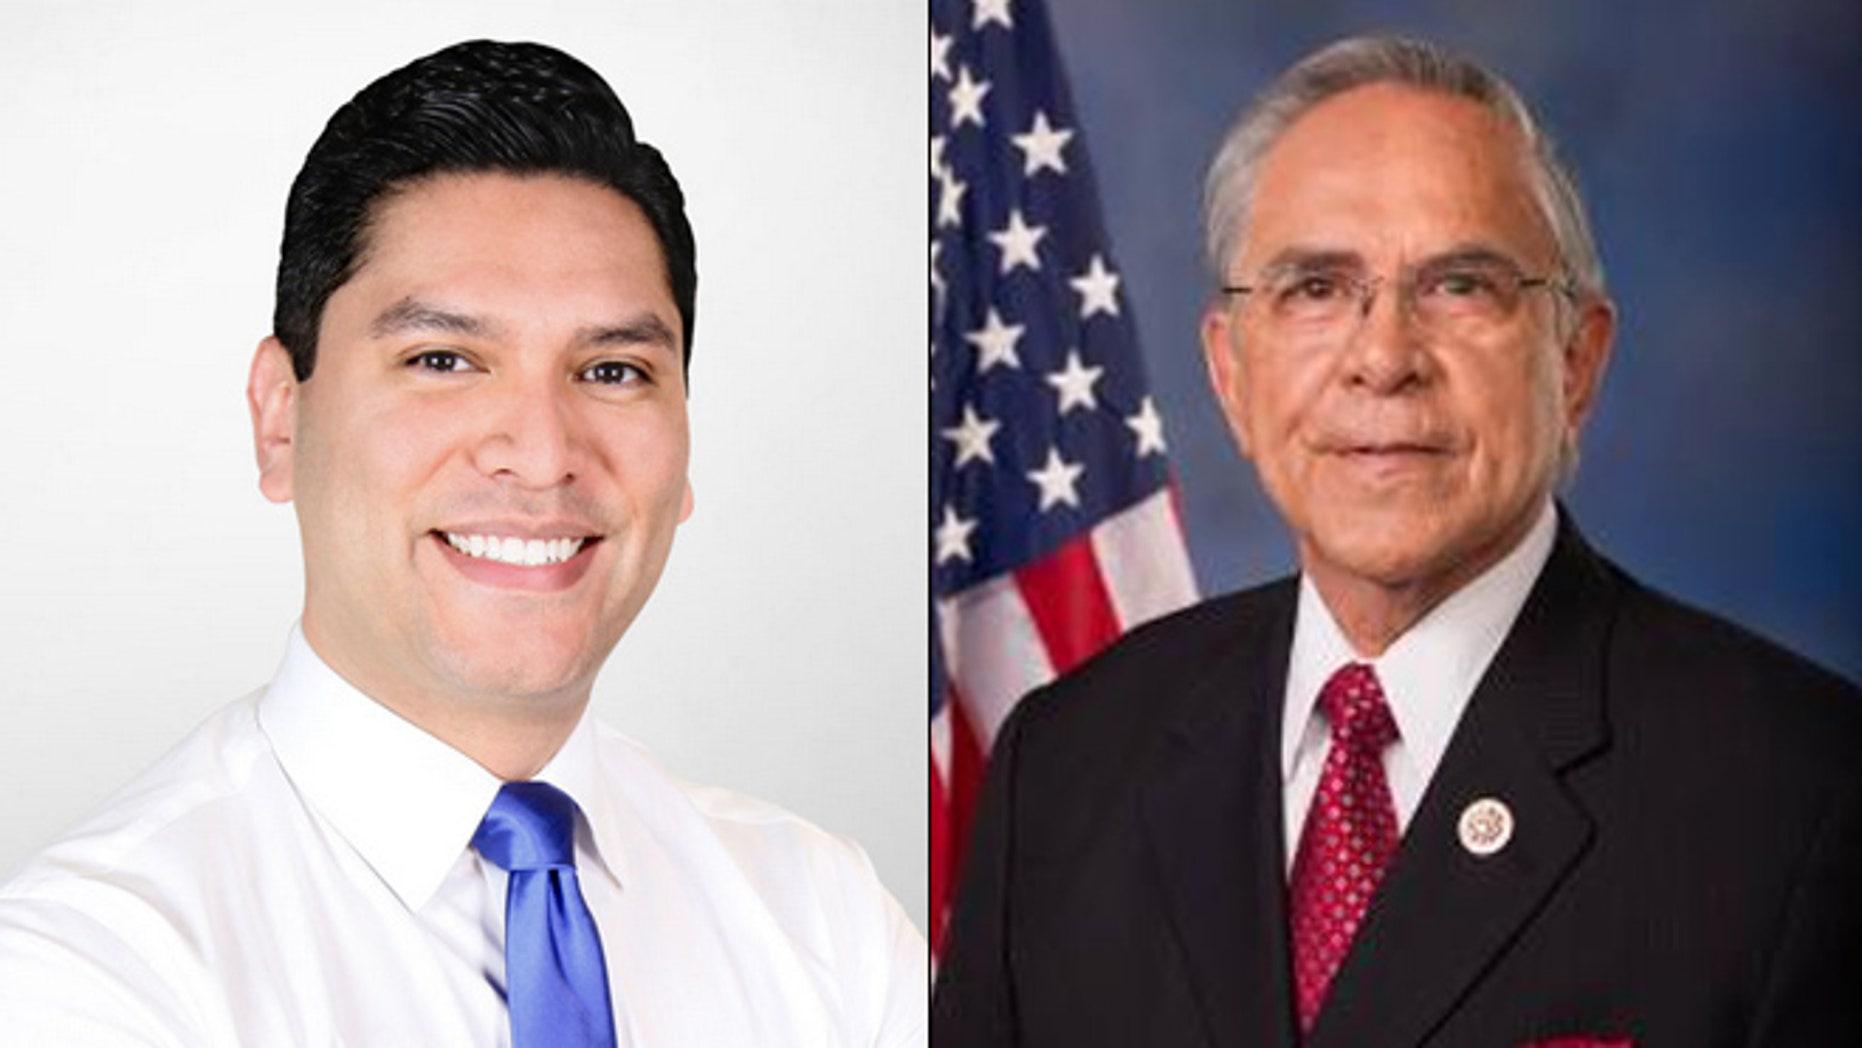 At left, House candidate Ruben Ramirez Hinojosa; at right, Rep. Ruben Hinojosa. (Ruben4congress.com/House.gov)